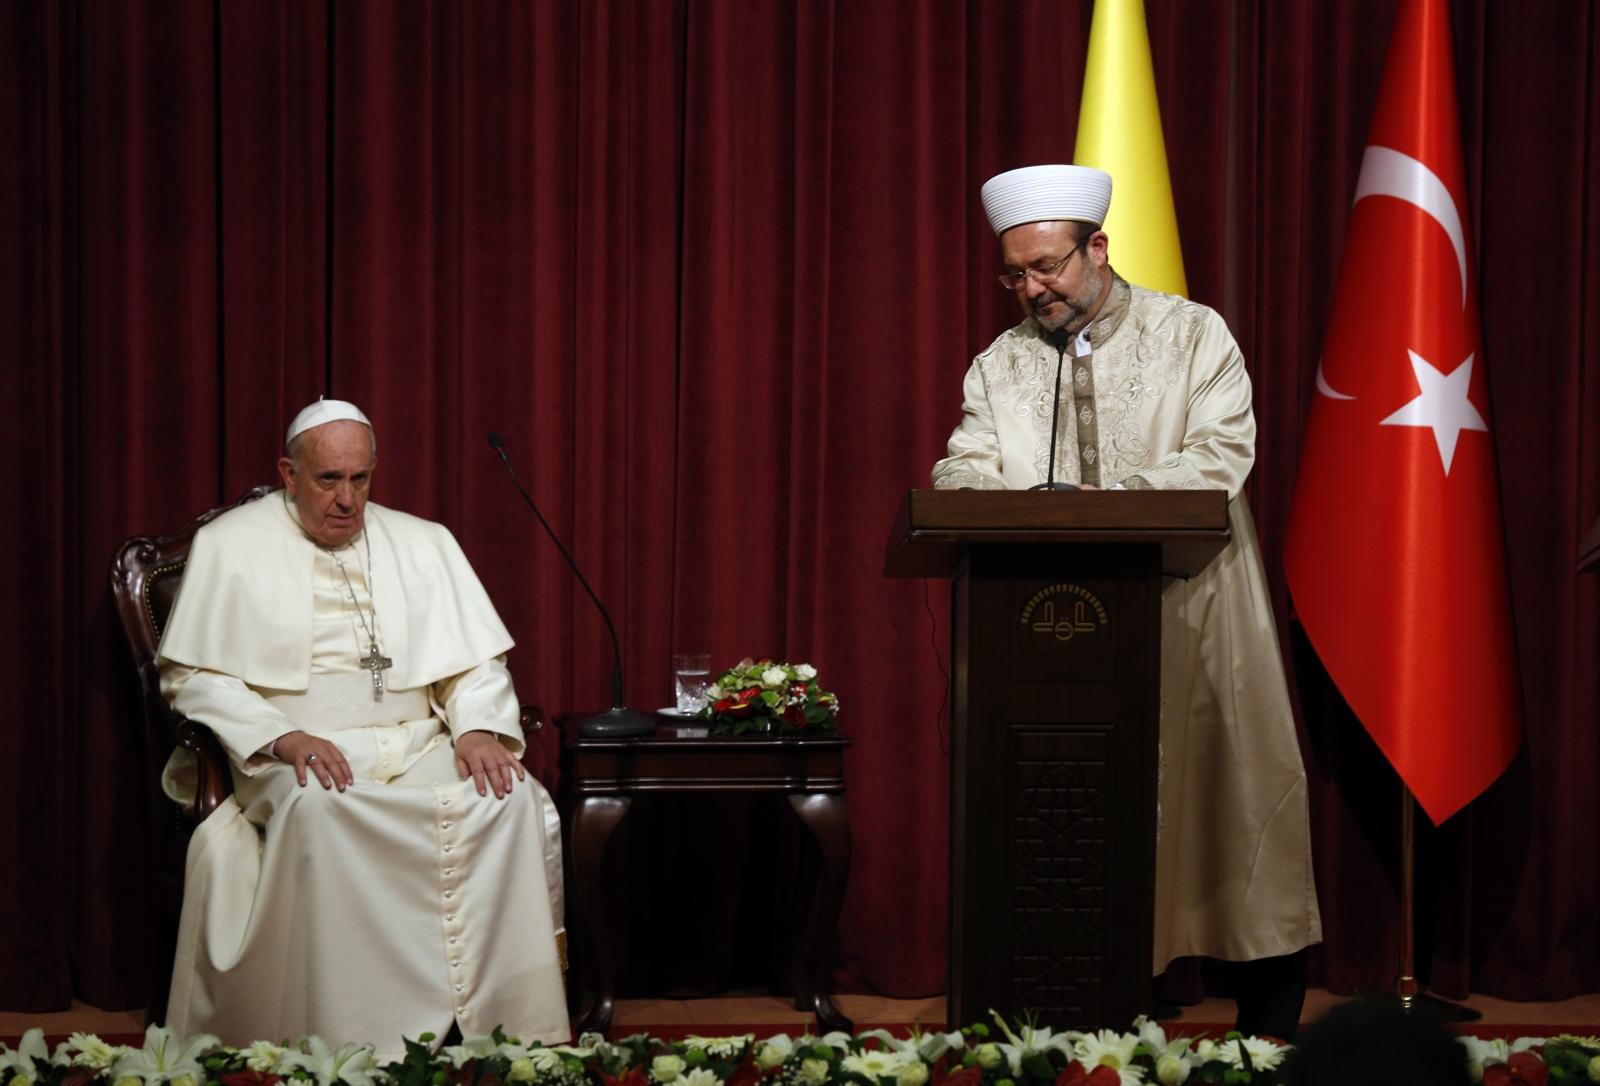 Pope Francis Armenian Genocide Turkey